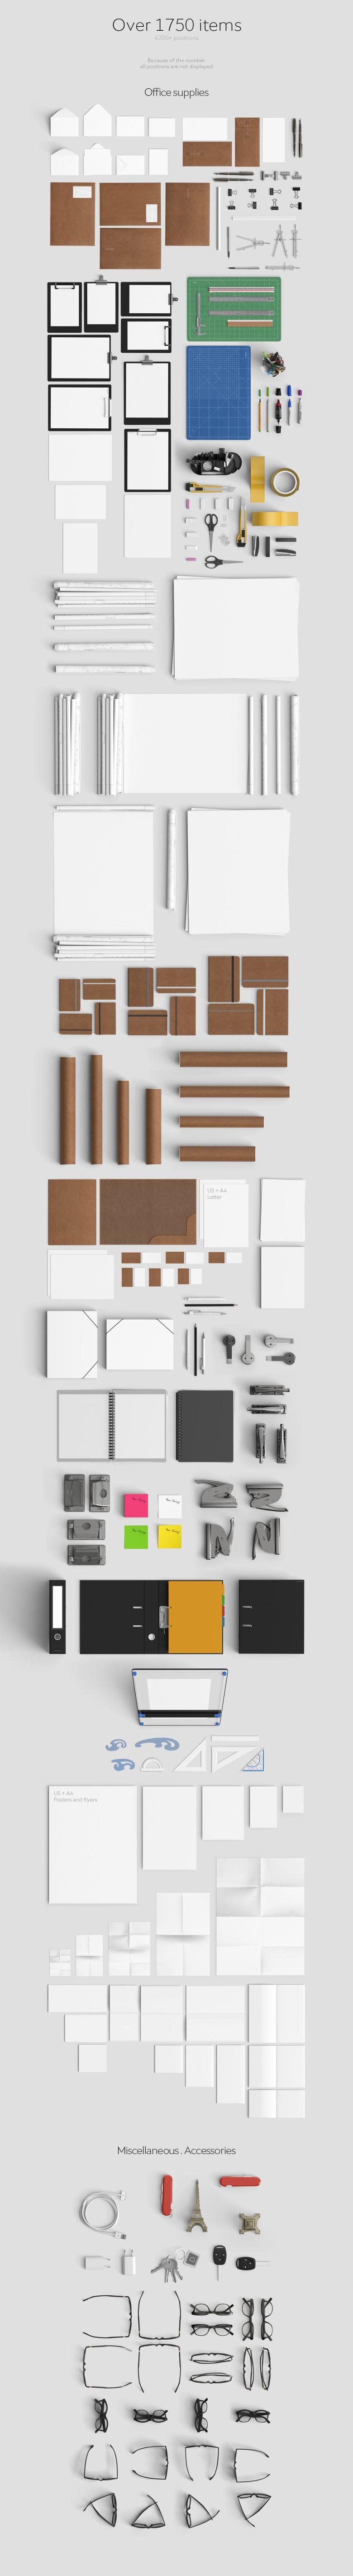 creative-market-scene-creator-bundle-09